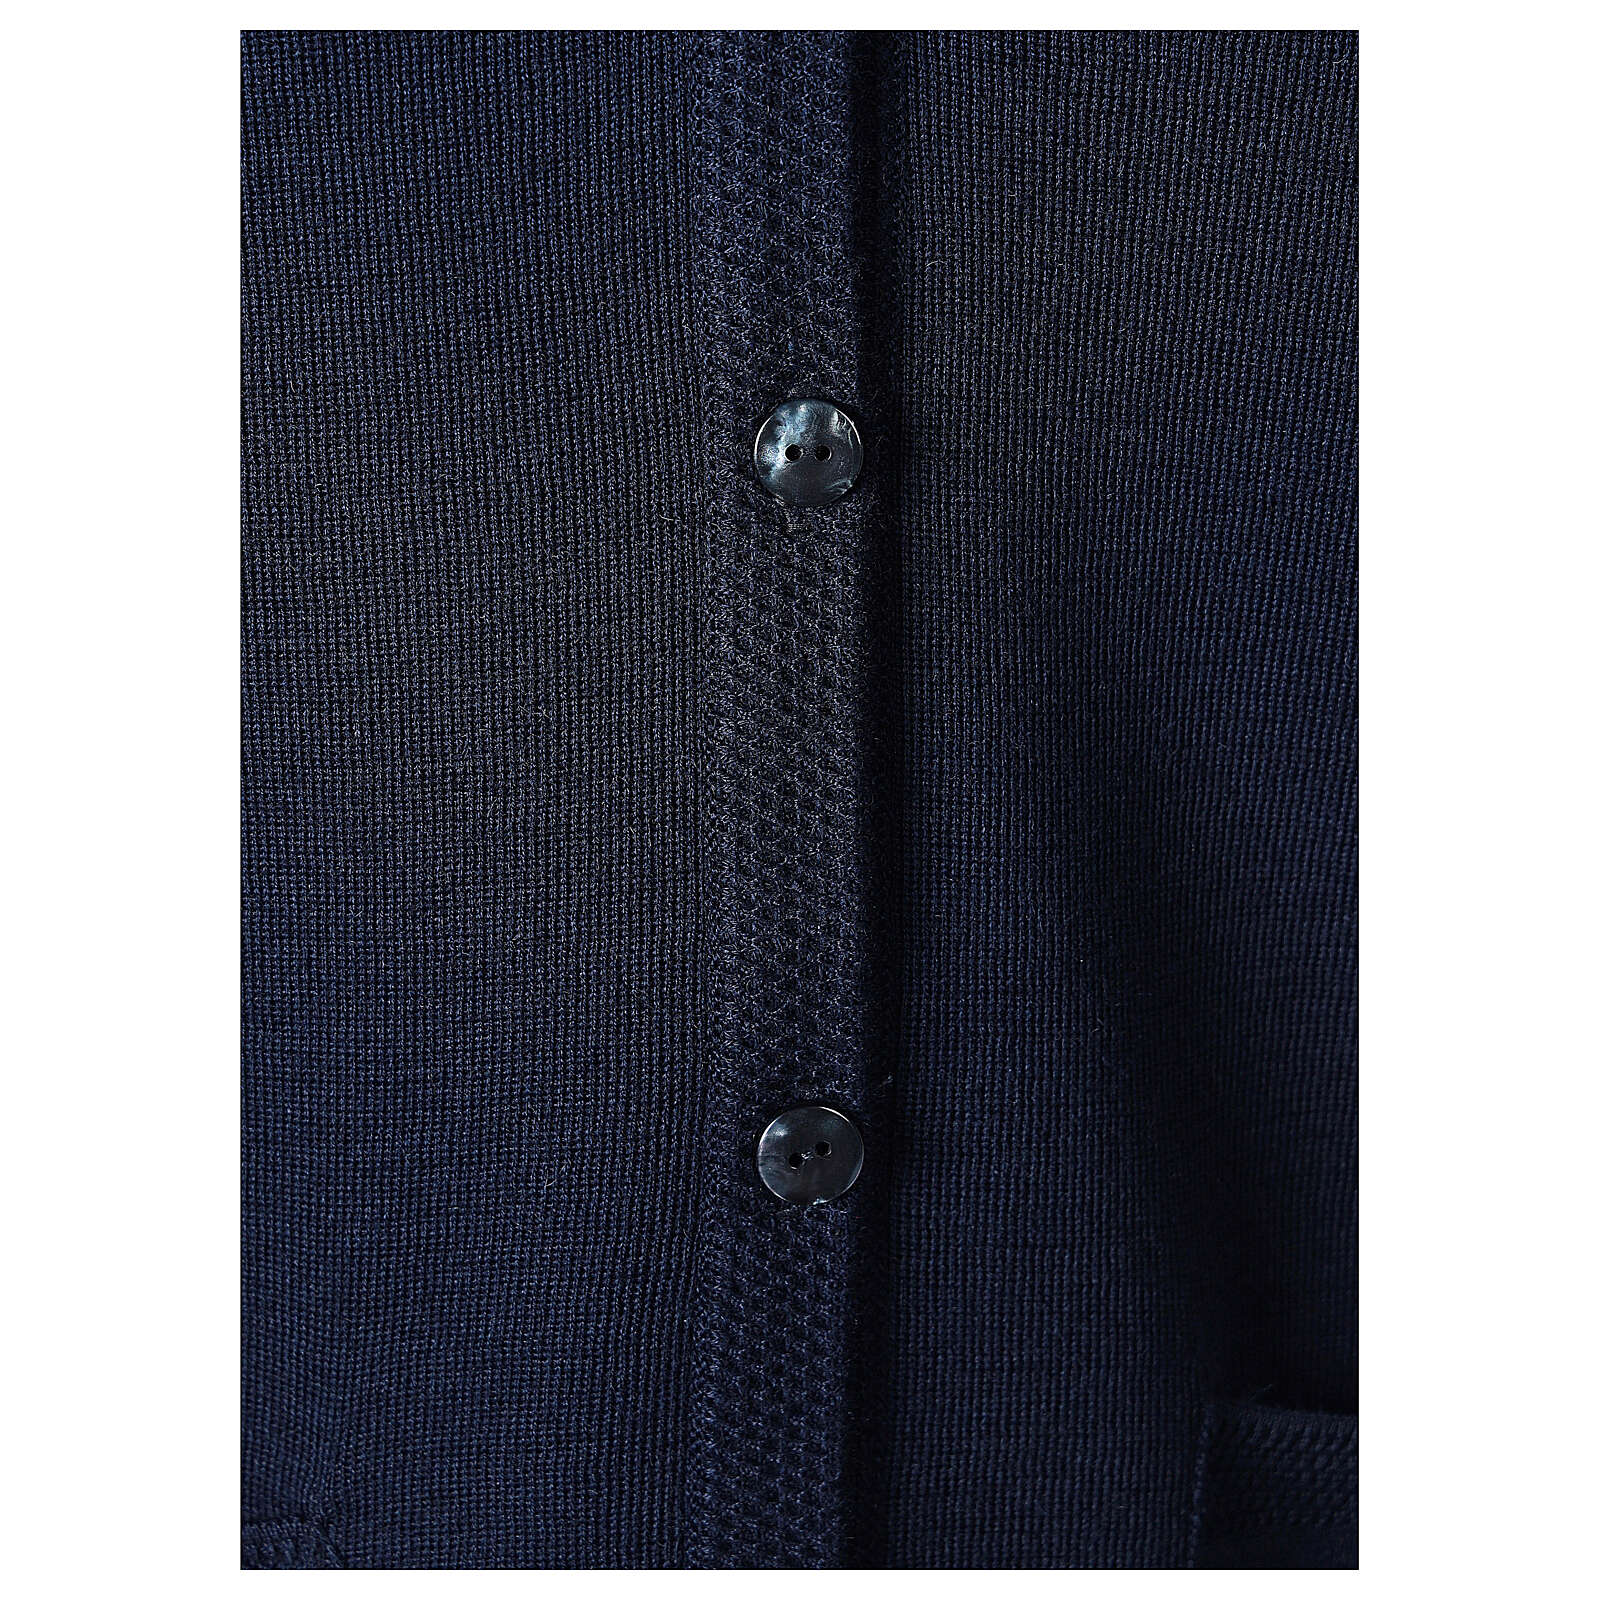 Nun blue sleeveless cardigan with V-neck and pockets PLUS SIZES 50% merino wool 50% acrylic In Primis 4